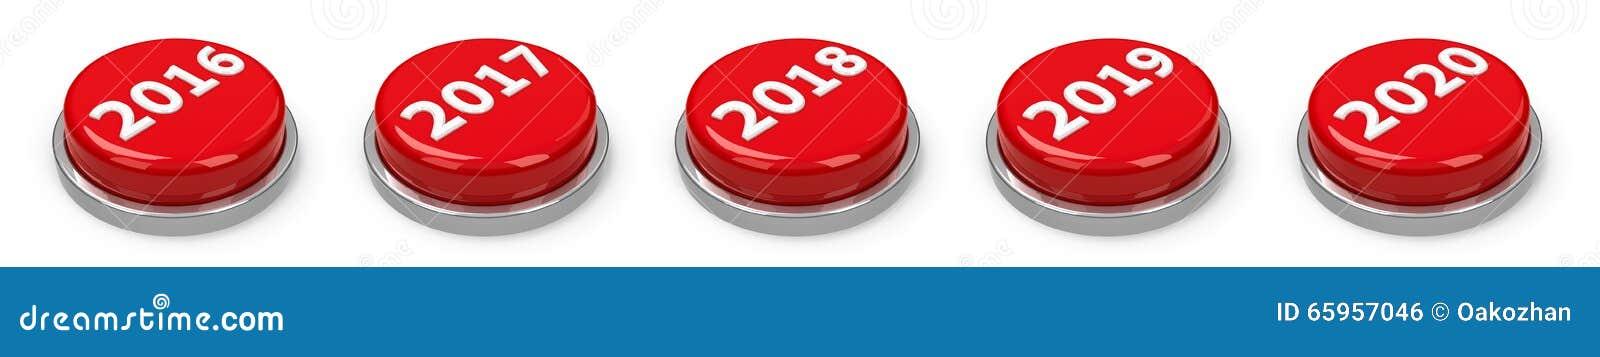 Guziki - 2016 2017 2018 2019 2020